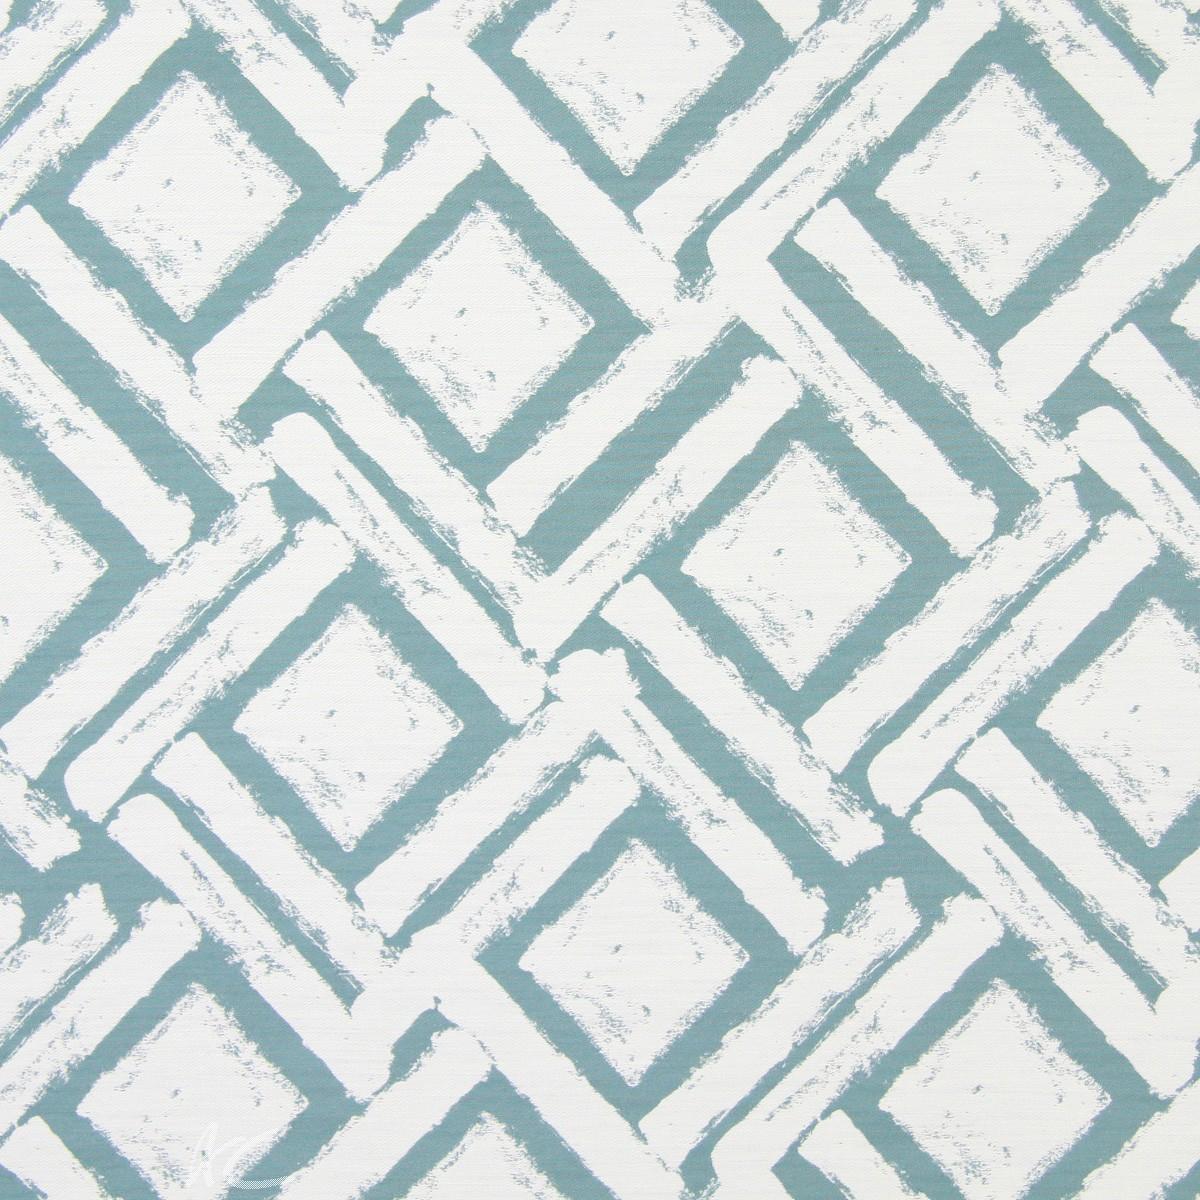 Indigo Colorado Azure Cushion Covers